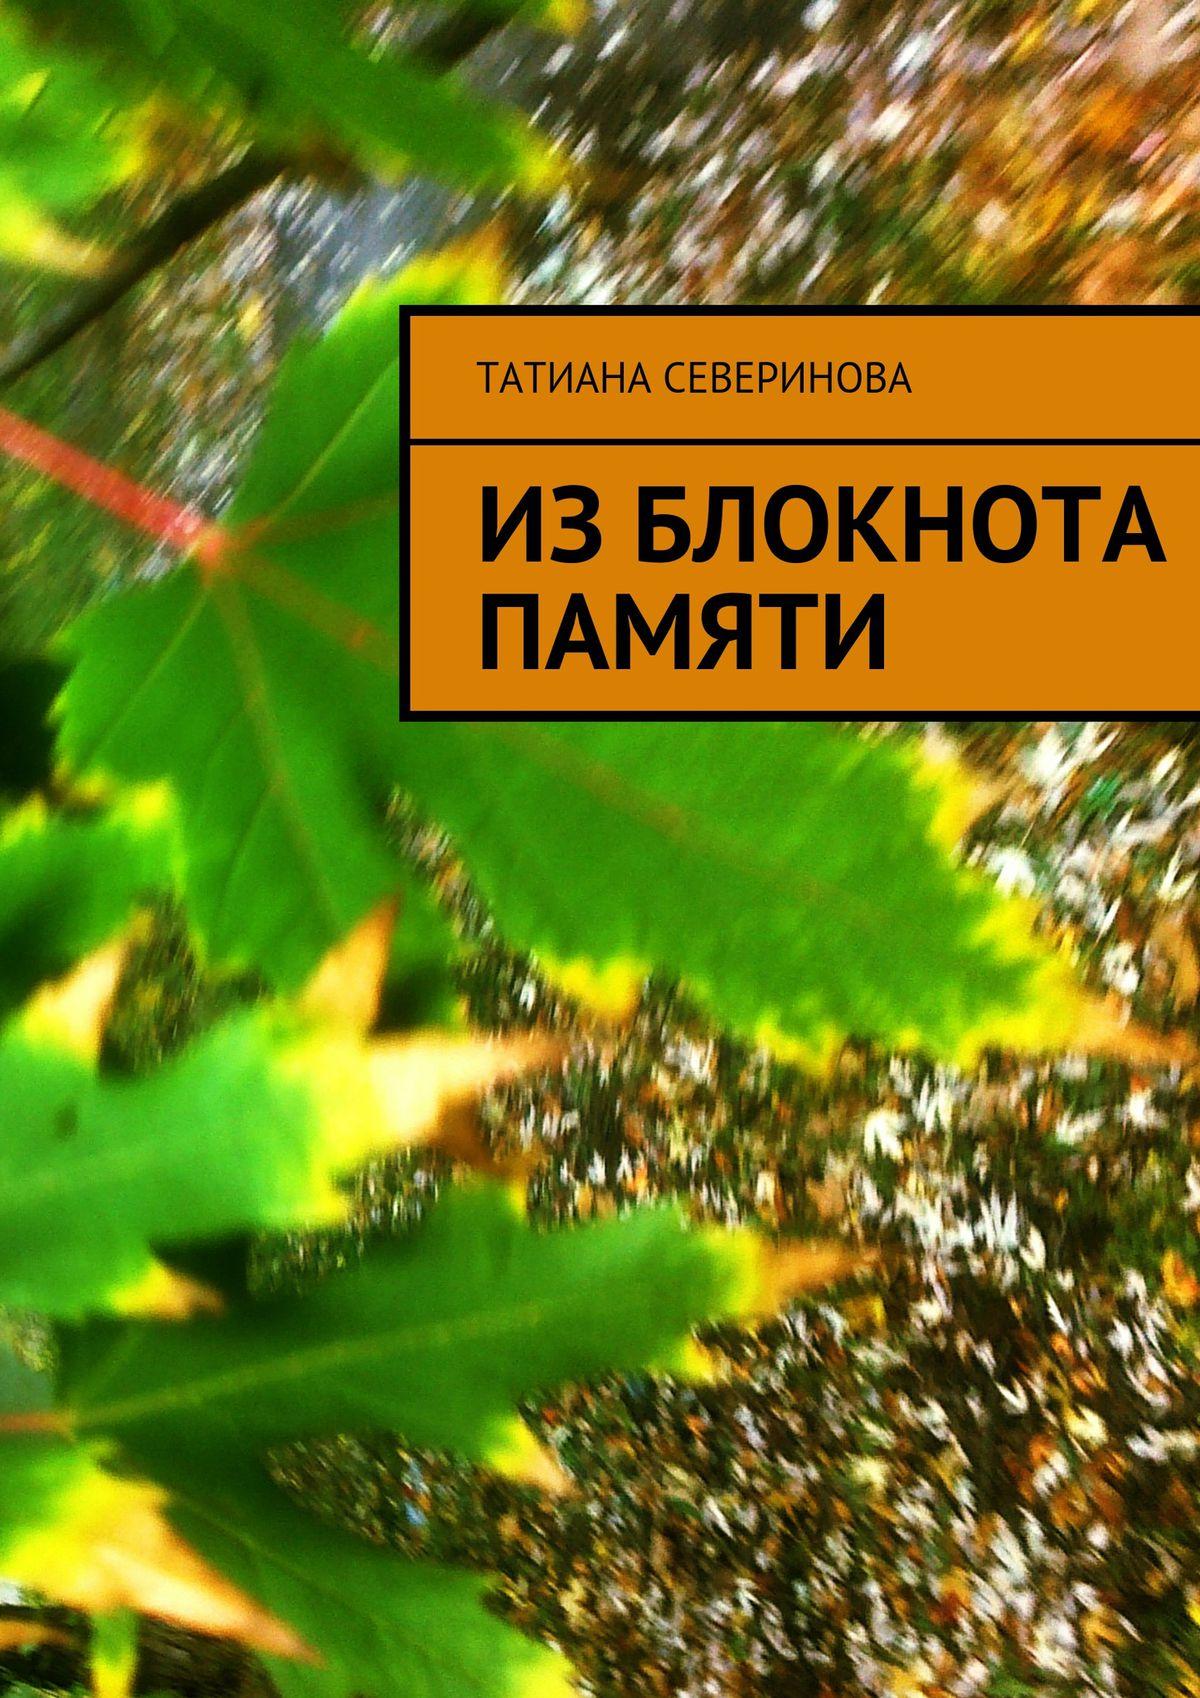 Татиана Северинова Изблокнота памяти татиана северинова кому то